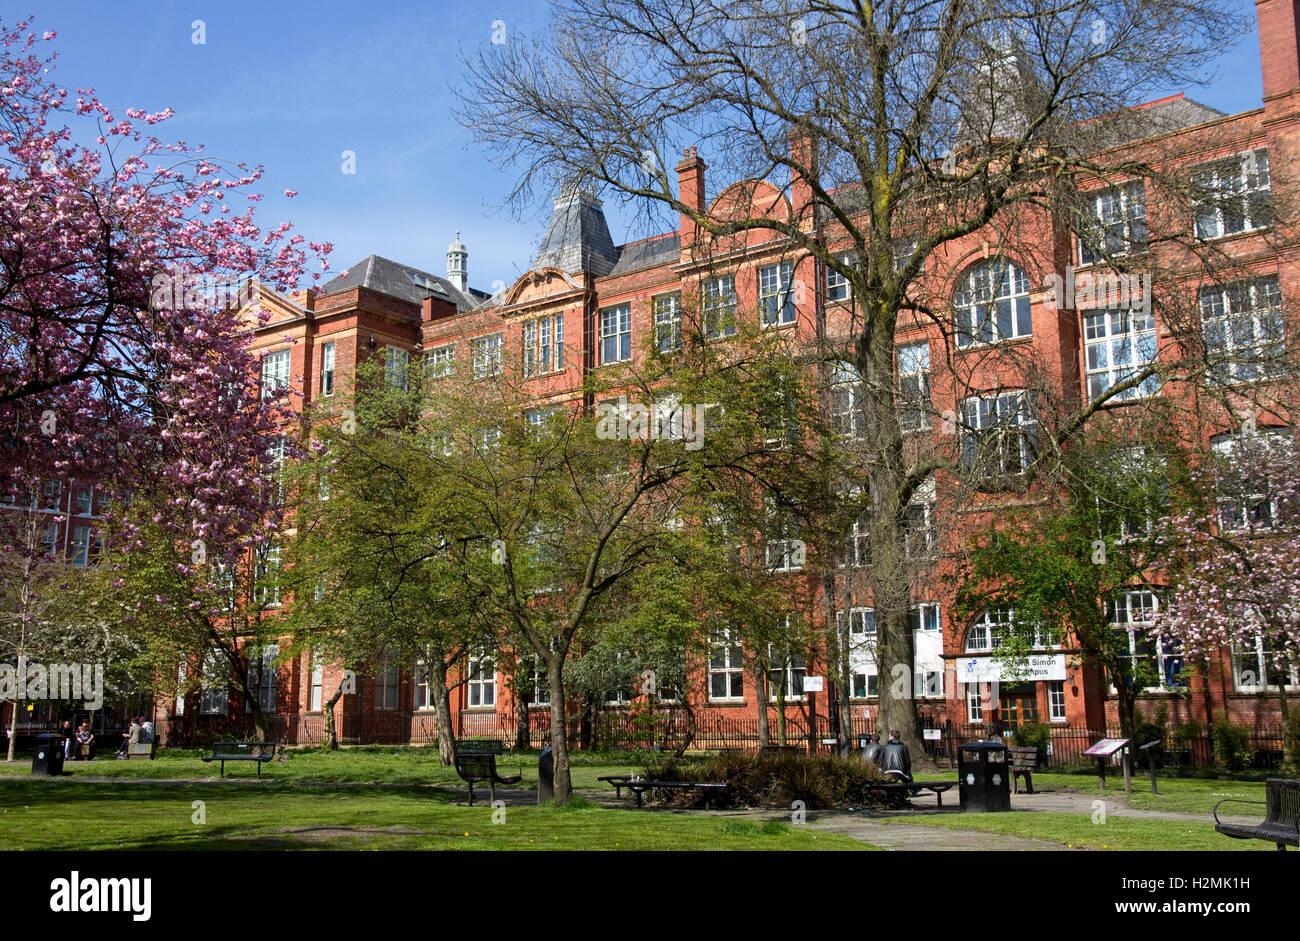 Shena Simon(City) Campus (6th Form Centre), Manchester College,+ Sackville (prev. Whitworth) Gardens, city centre - Stock Image